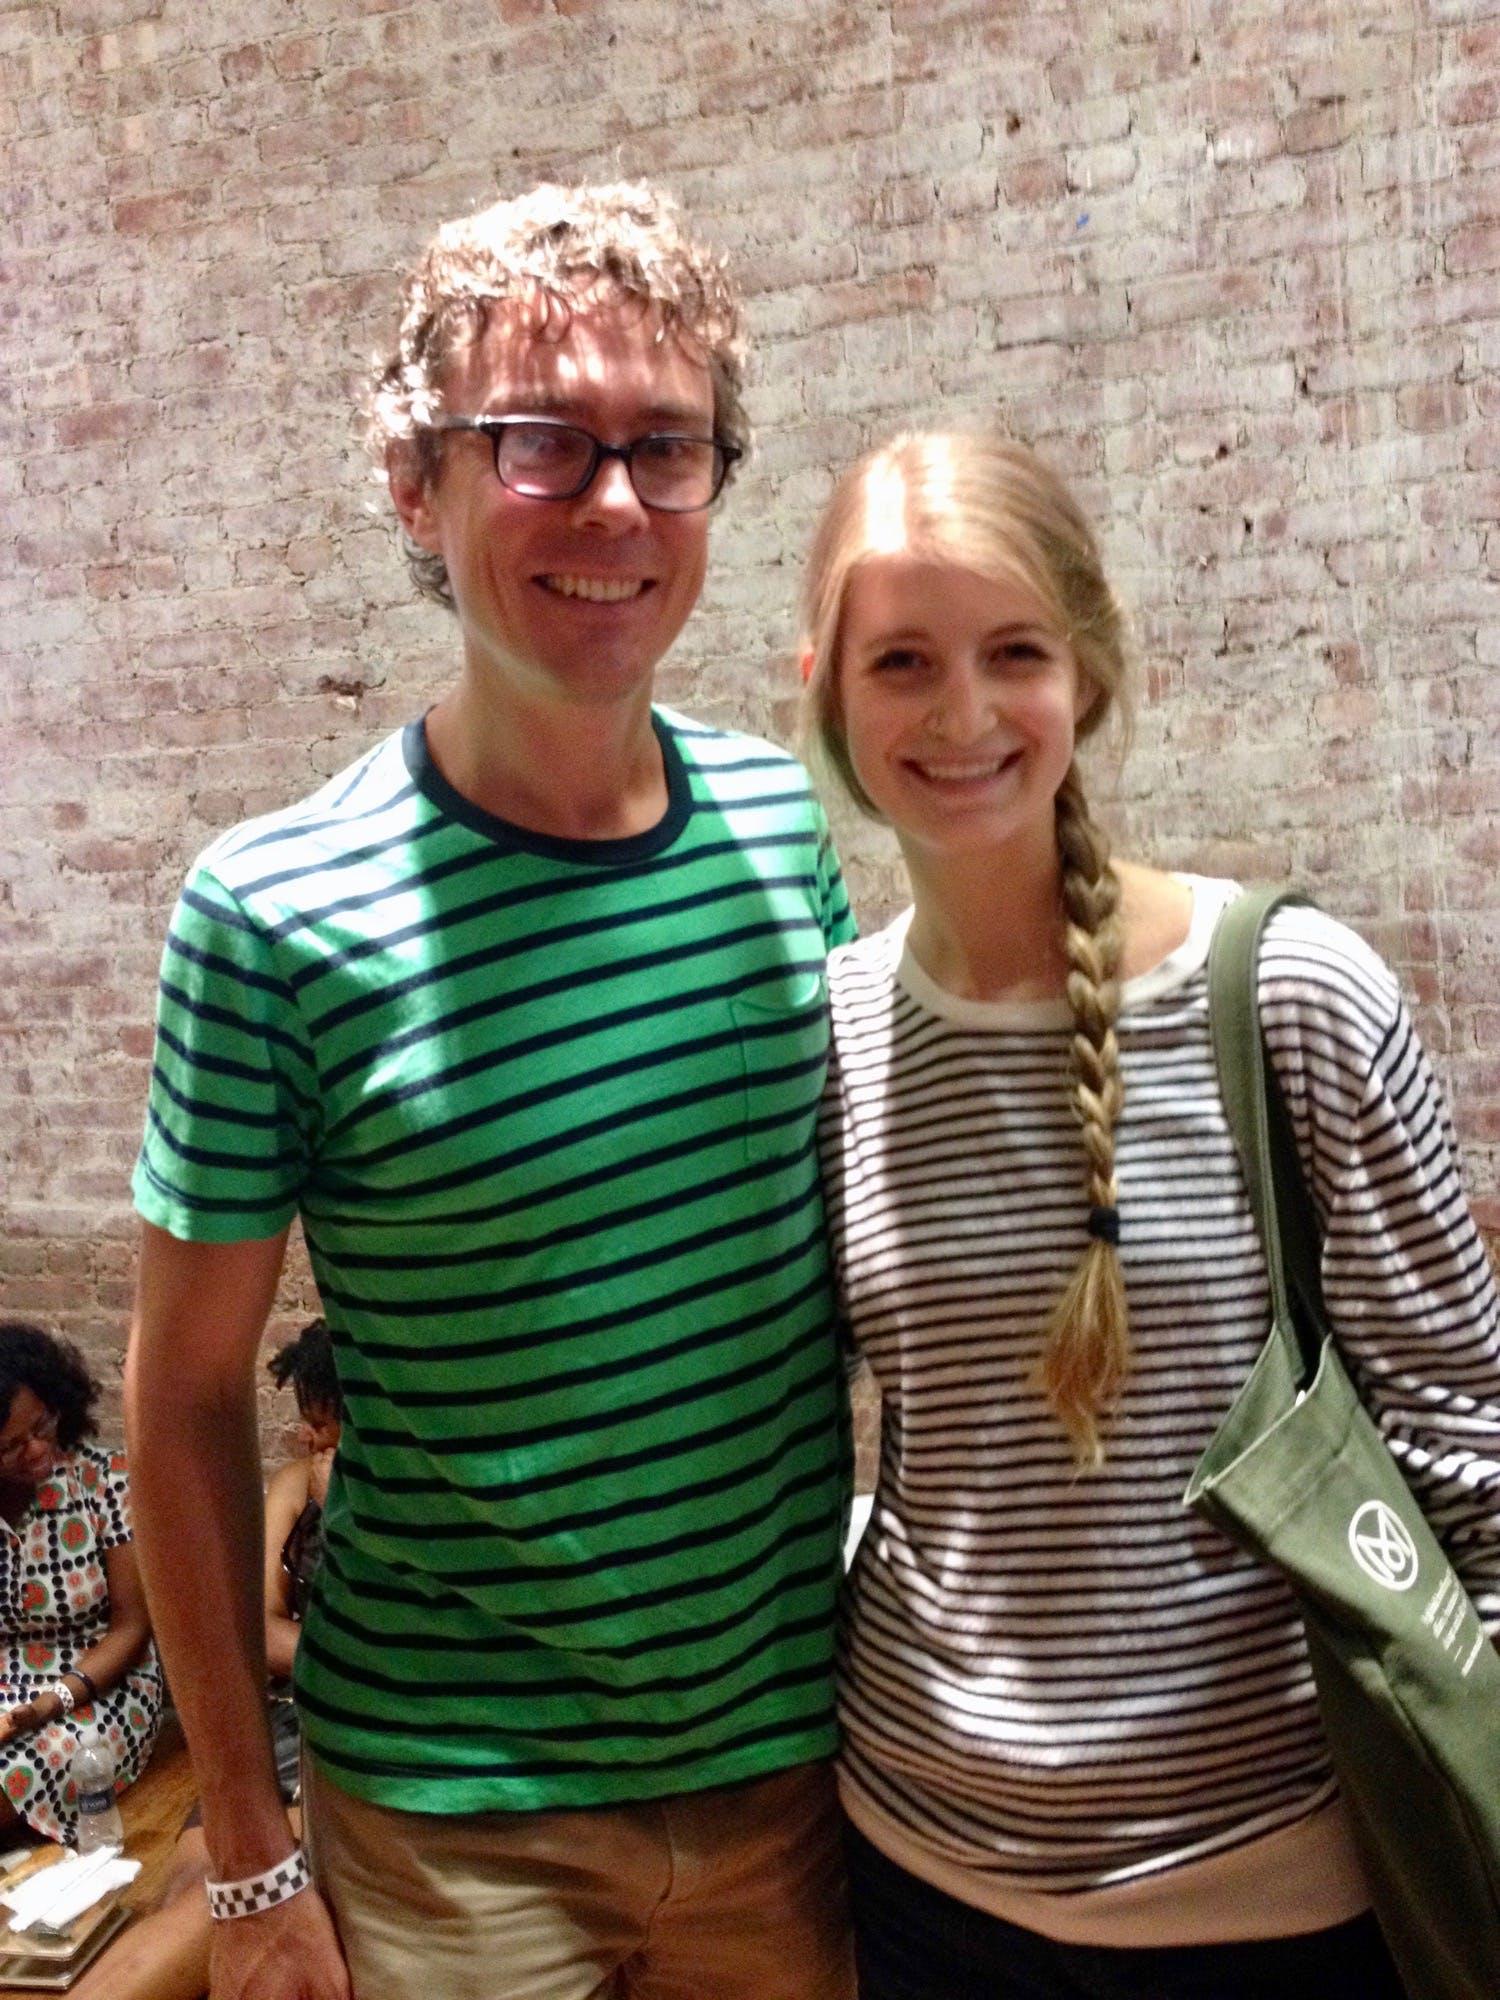 Scott Jurek and Amanda Kievet